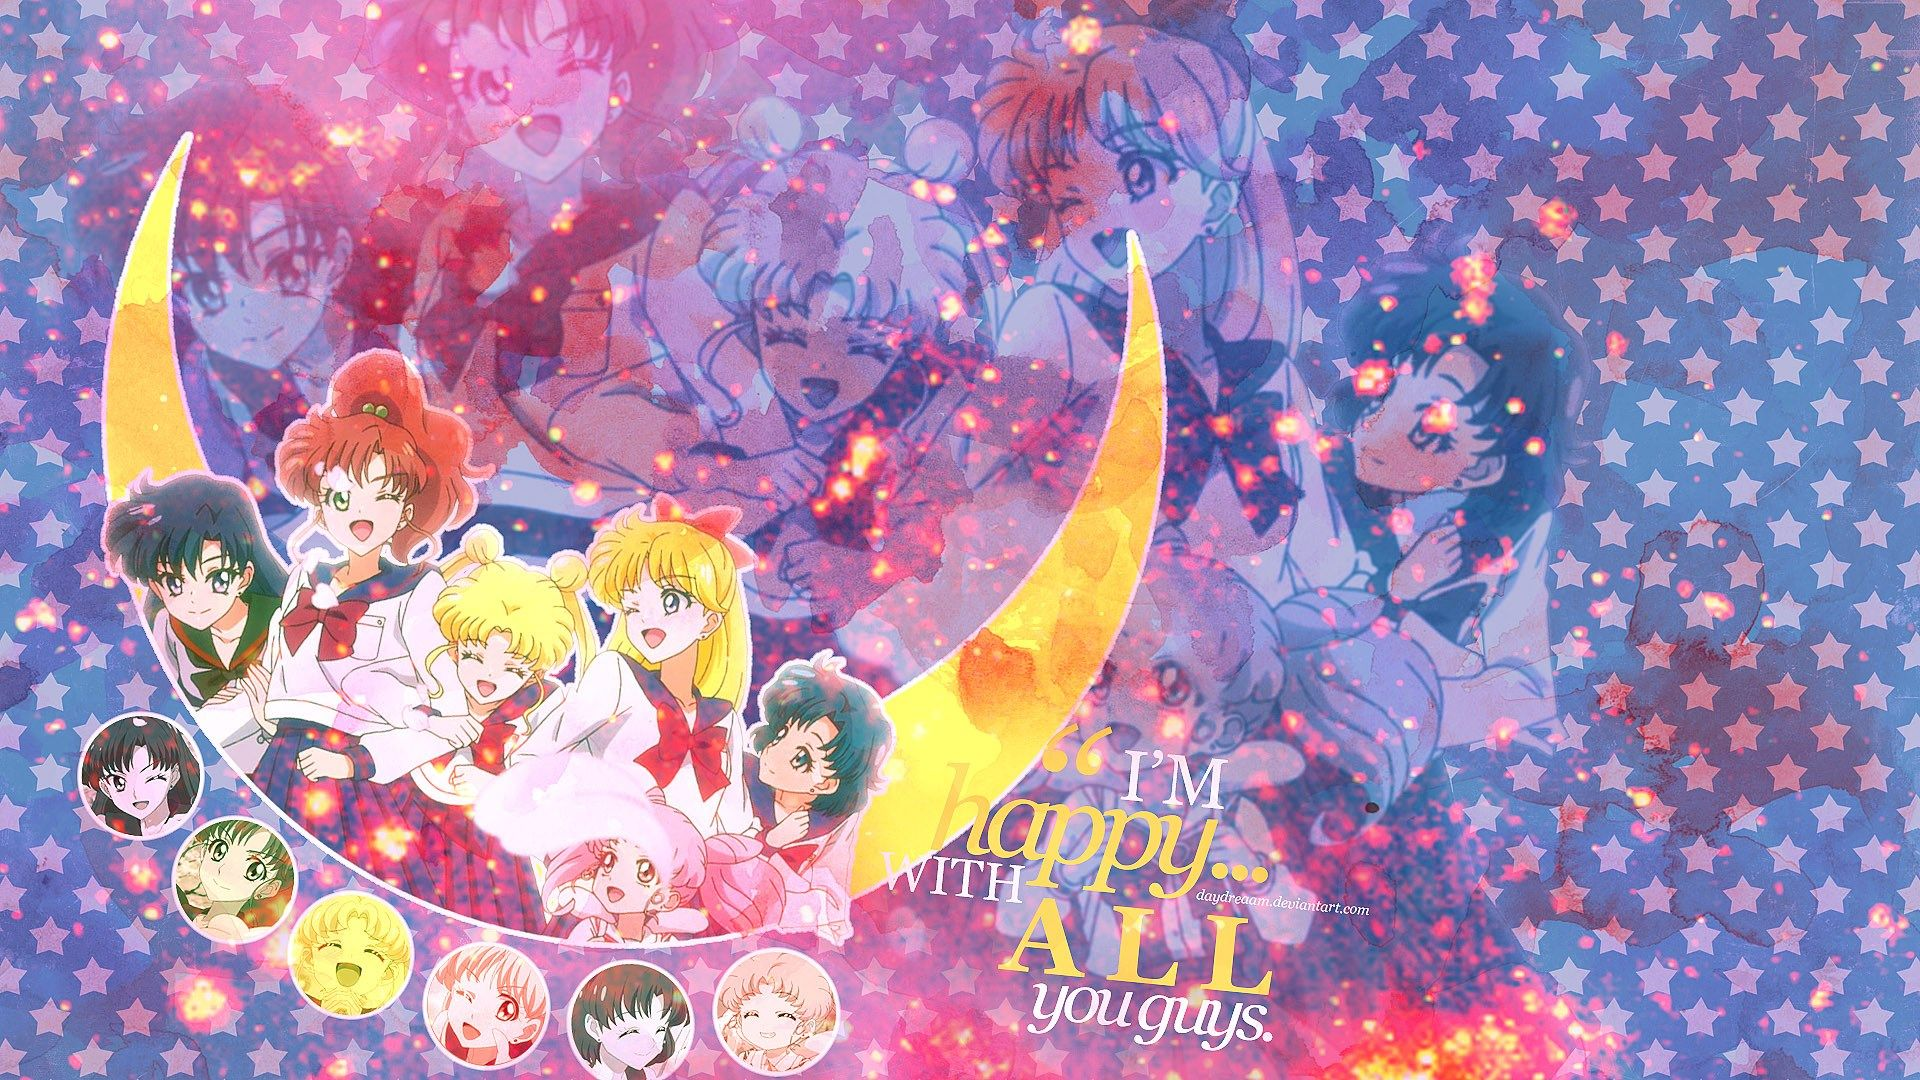 1920x1080 Hd Wallpaper Sailor Moon Sailor Moon Wallpaper Sailor Moon Sailor Moon Background High quality sailor moon hd wallpaper